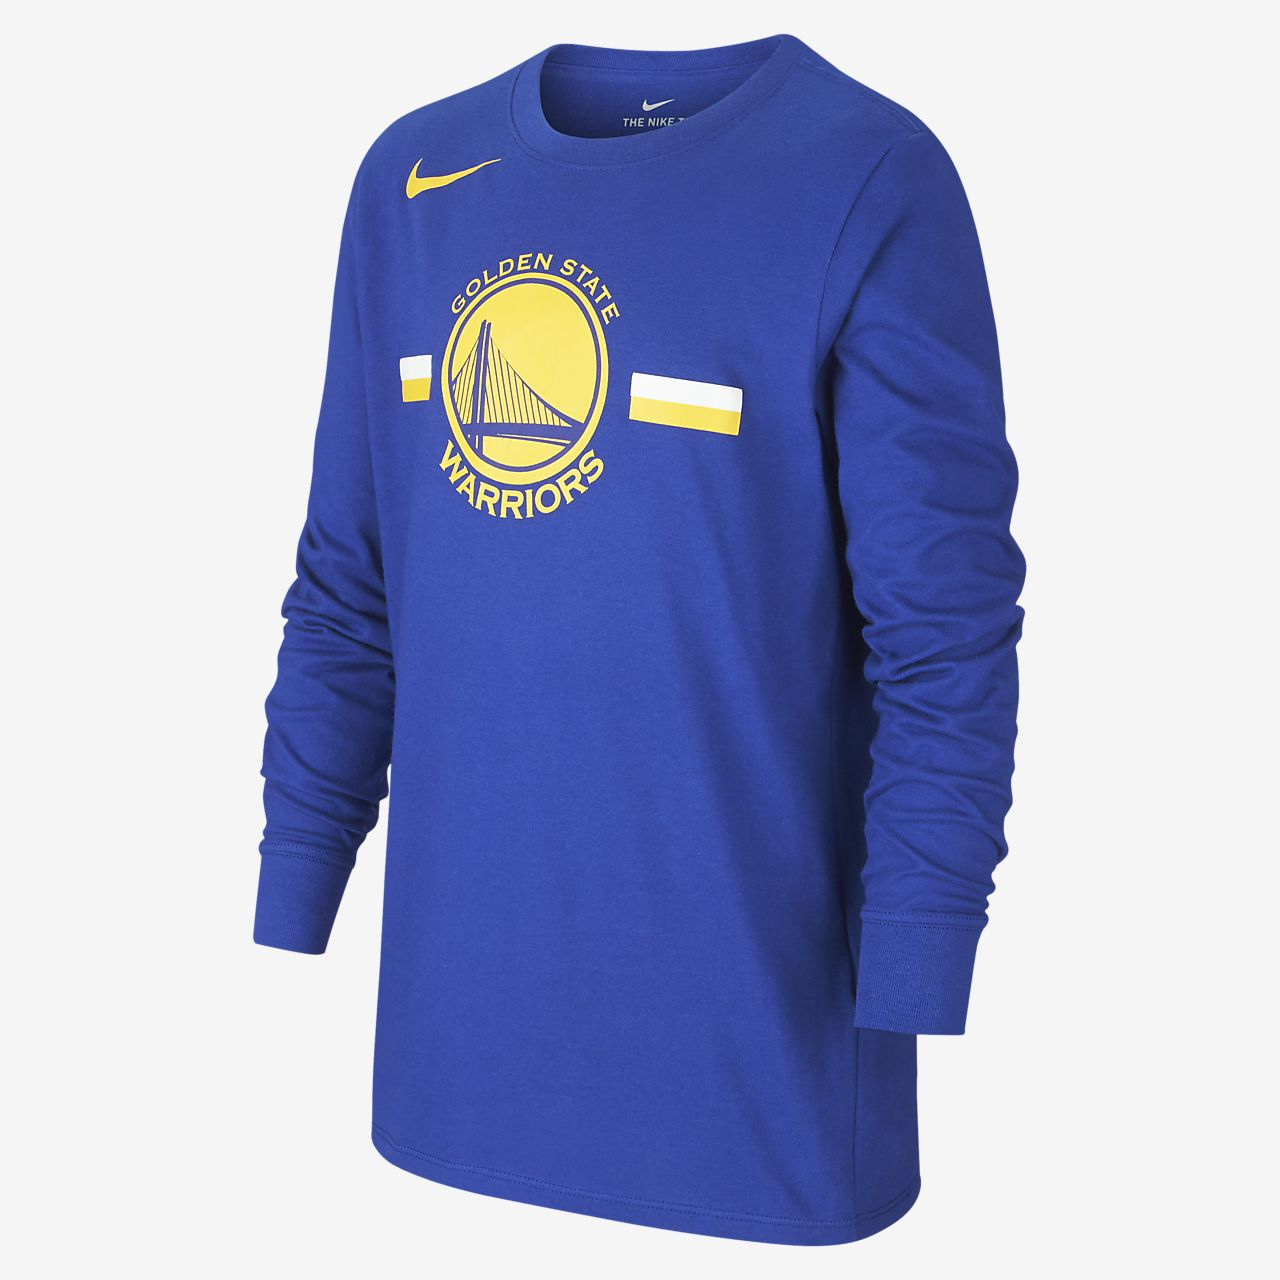 Golden State Warriors Nike Dri-FIT Logo Langarm-NBA-T-Shirt für ältere Kinder